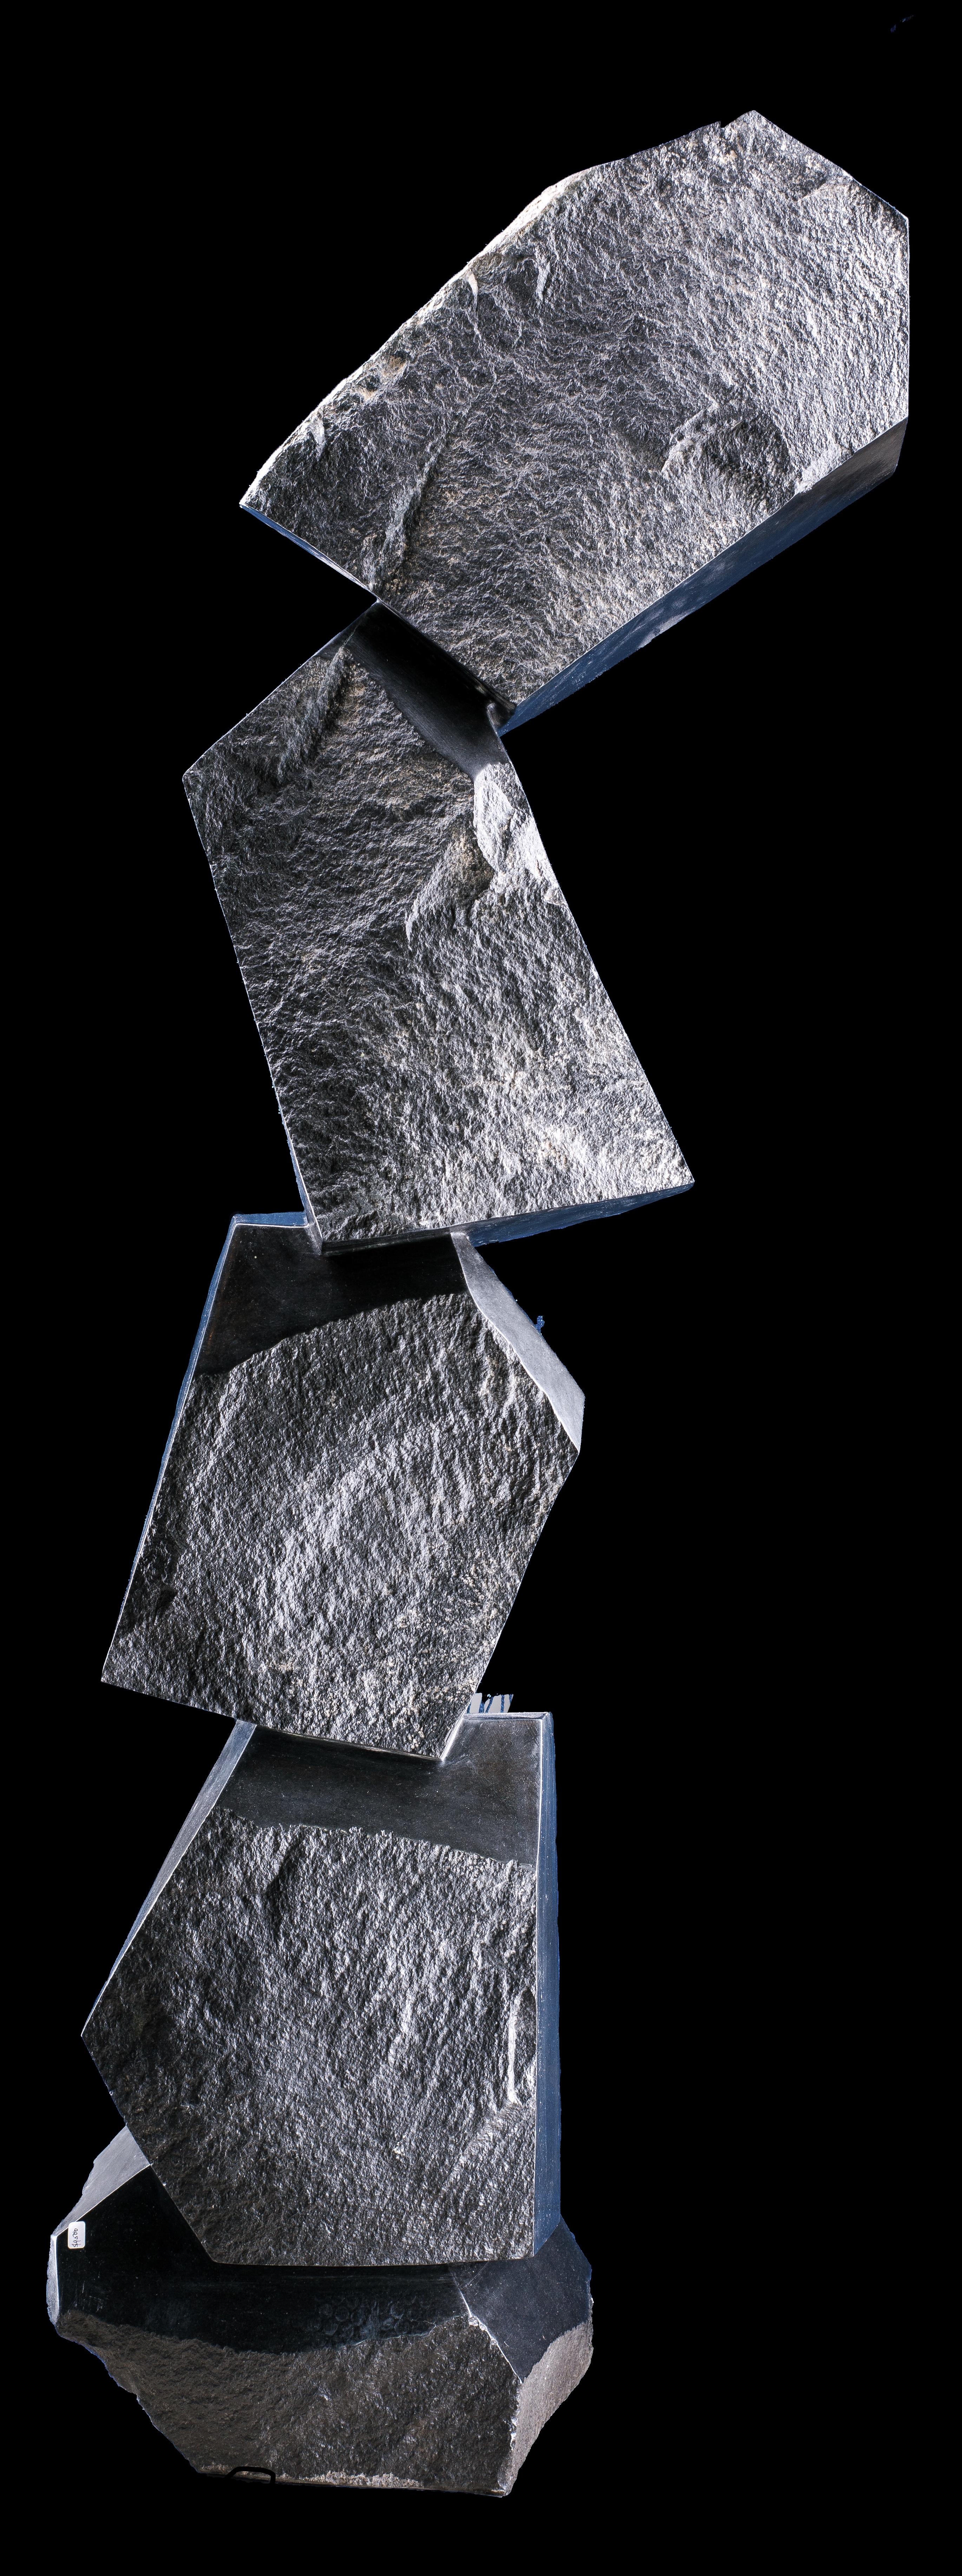 Balancing Blocks